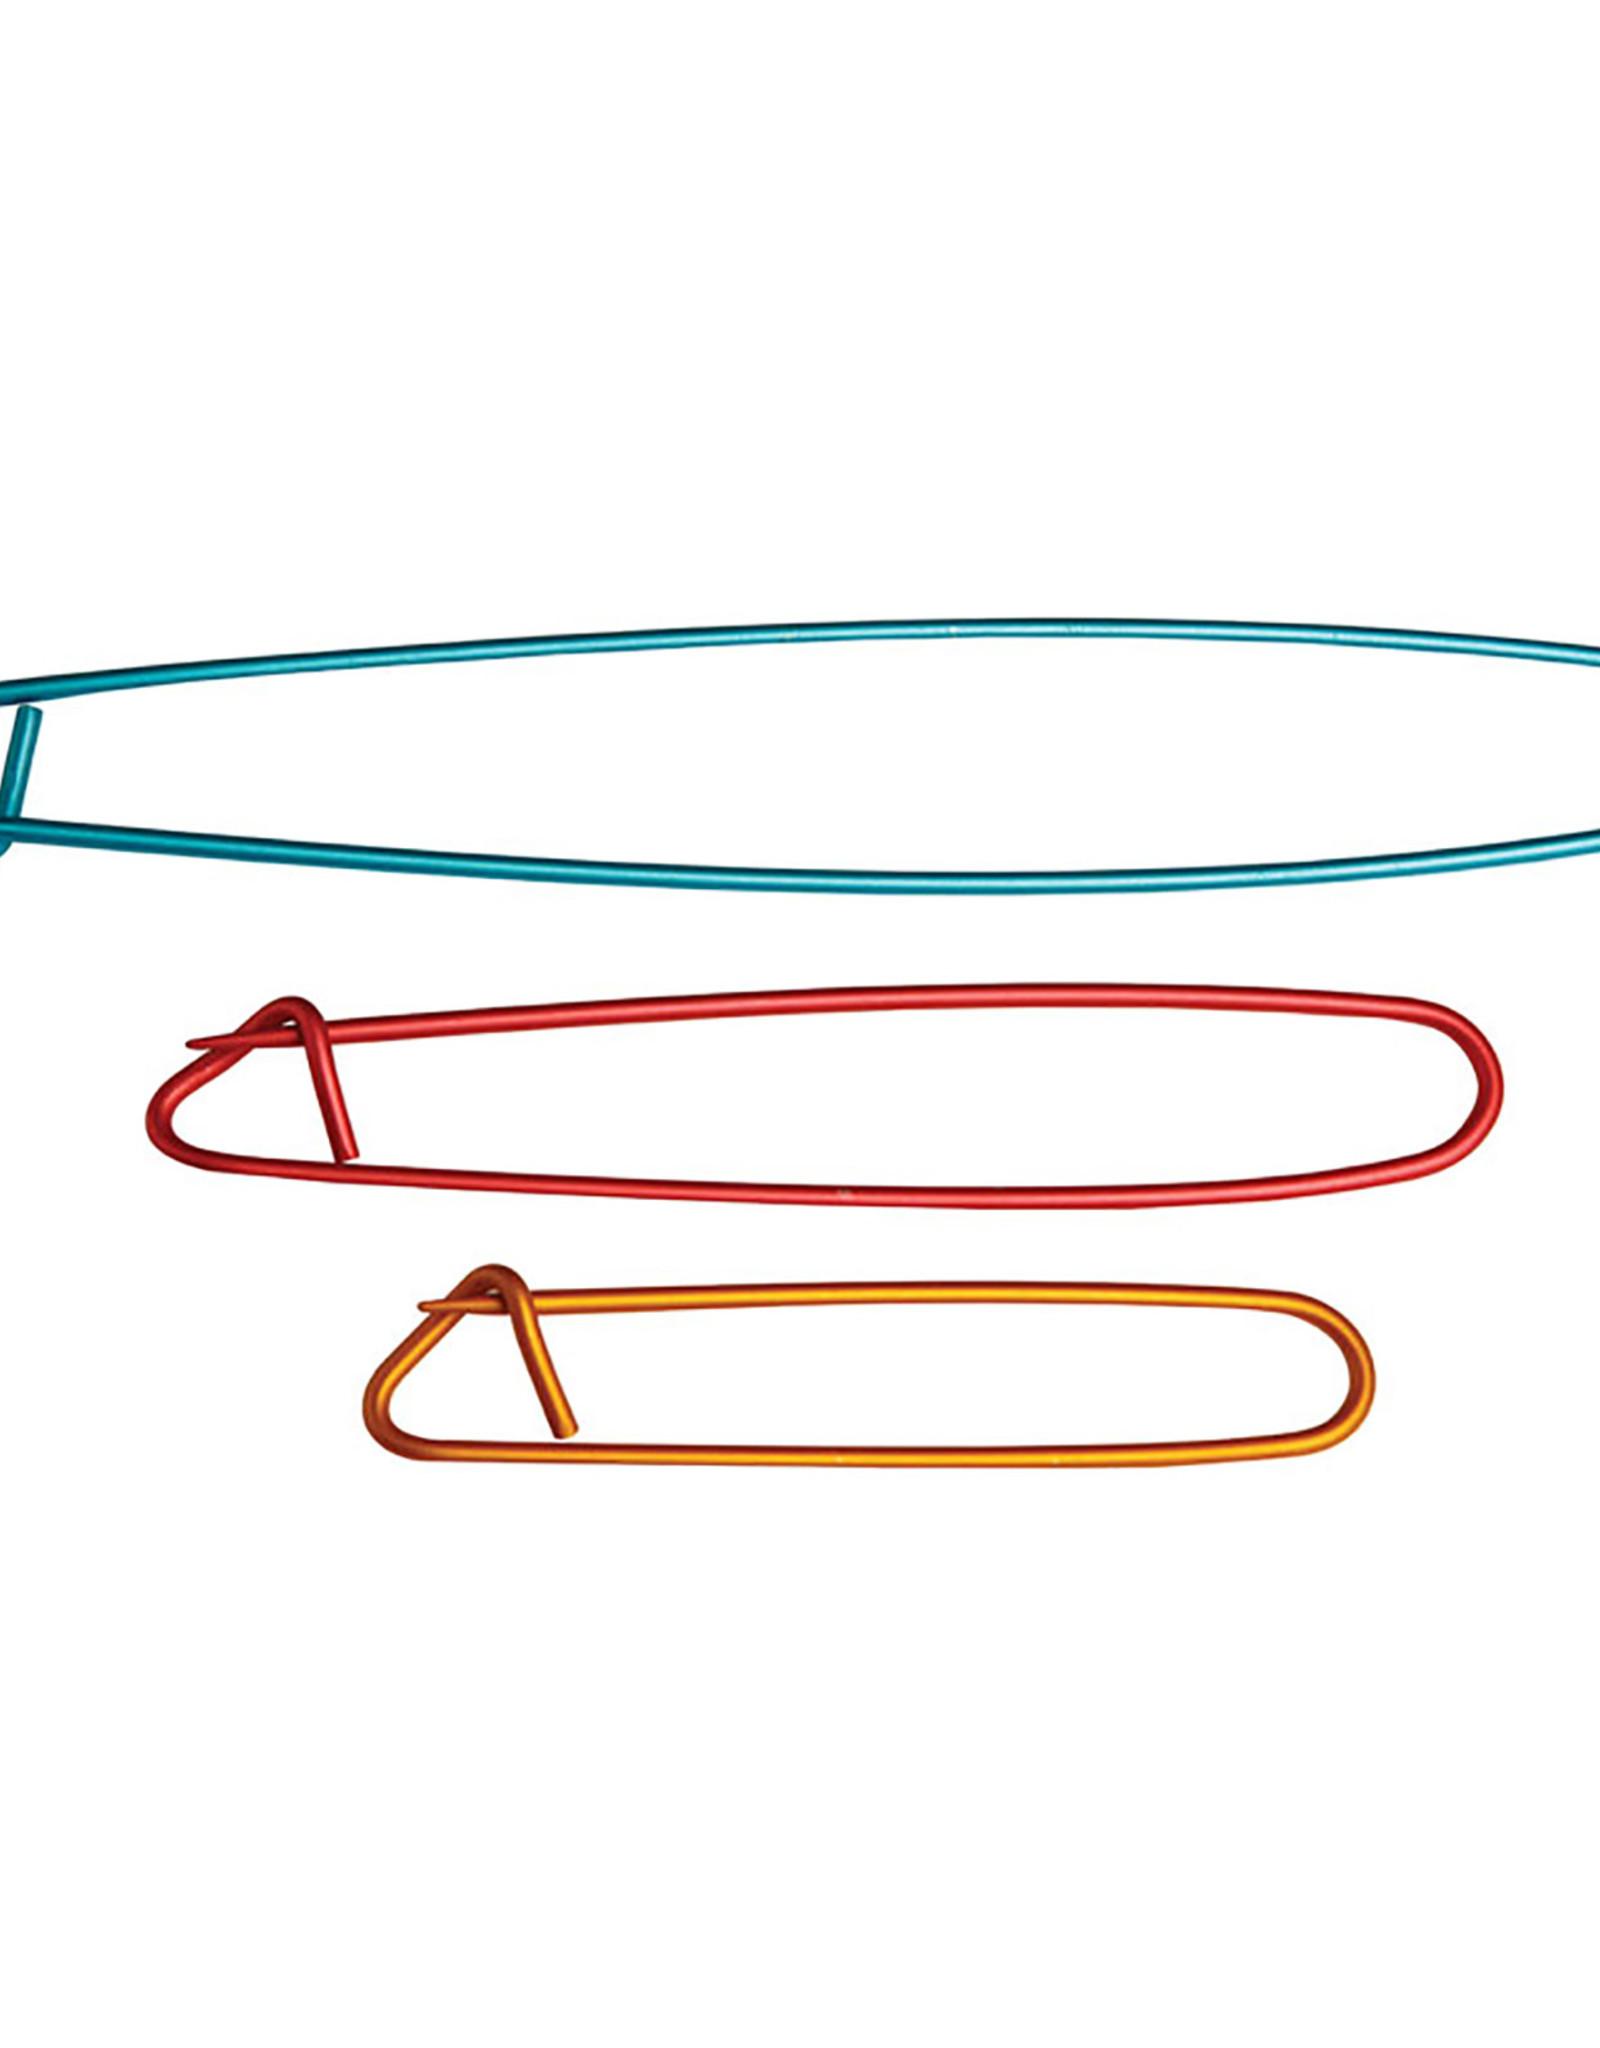 Aluminum Stitch Holders (Set of 3)